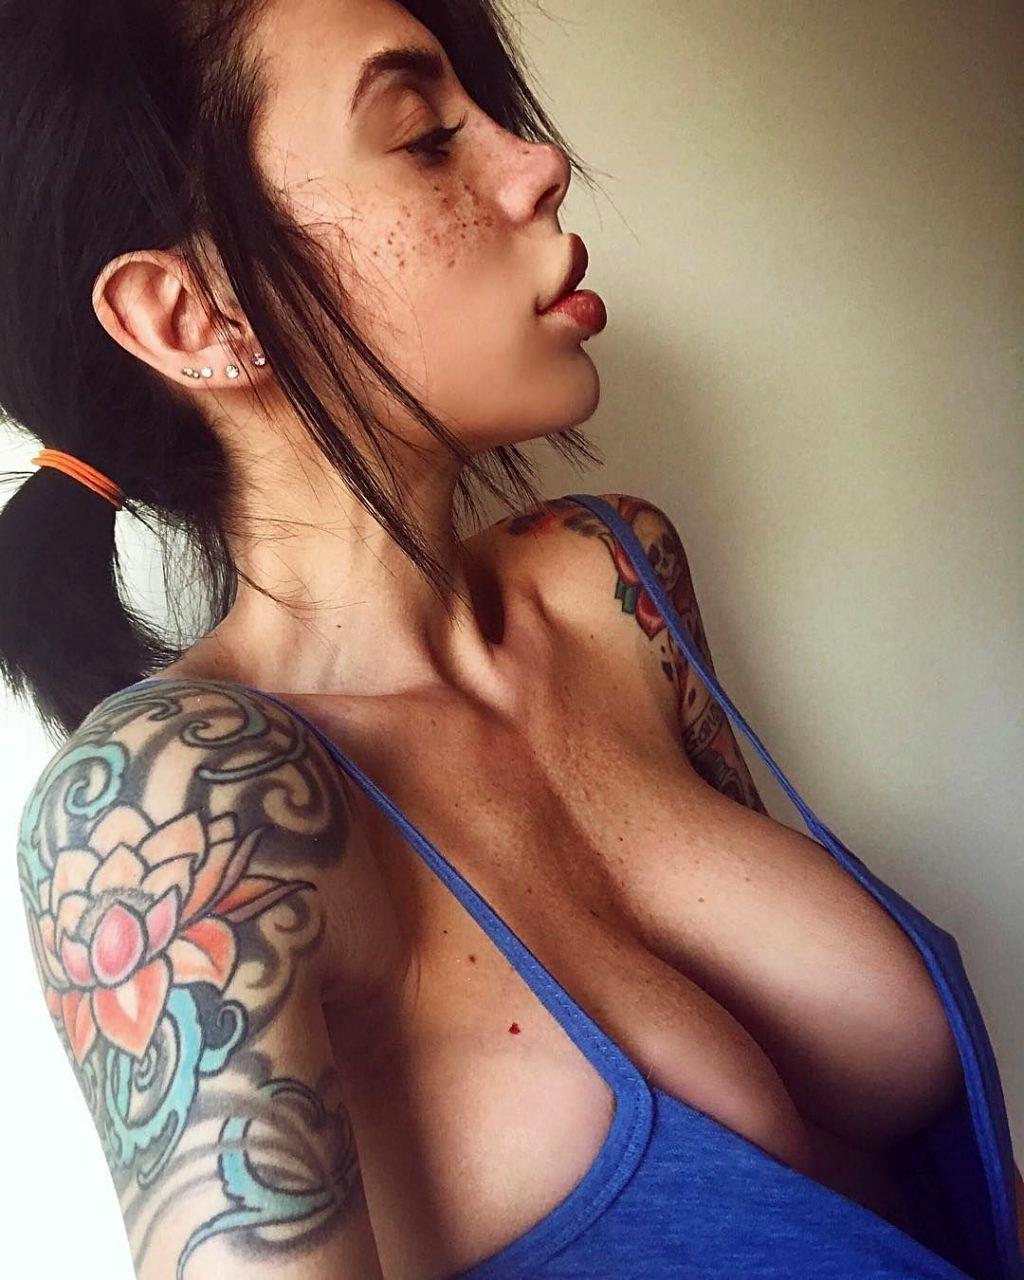 Ashley sherkat naked